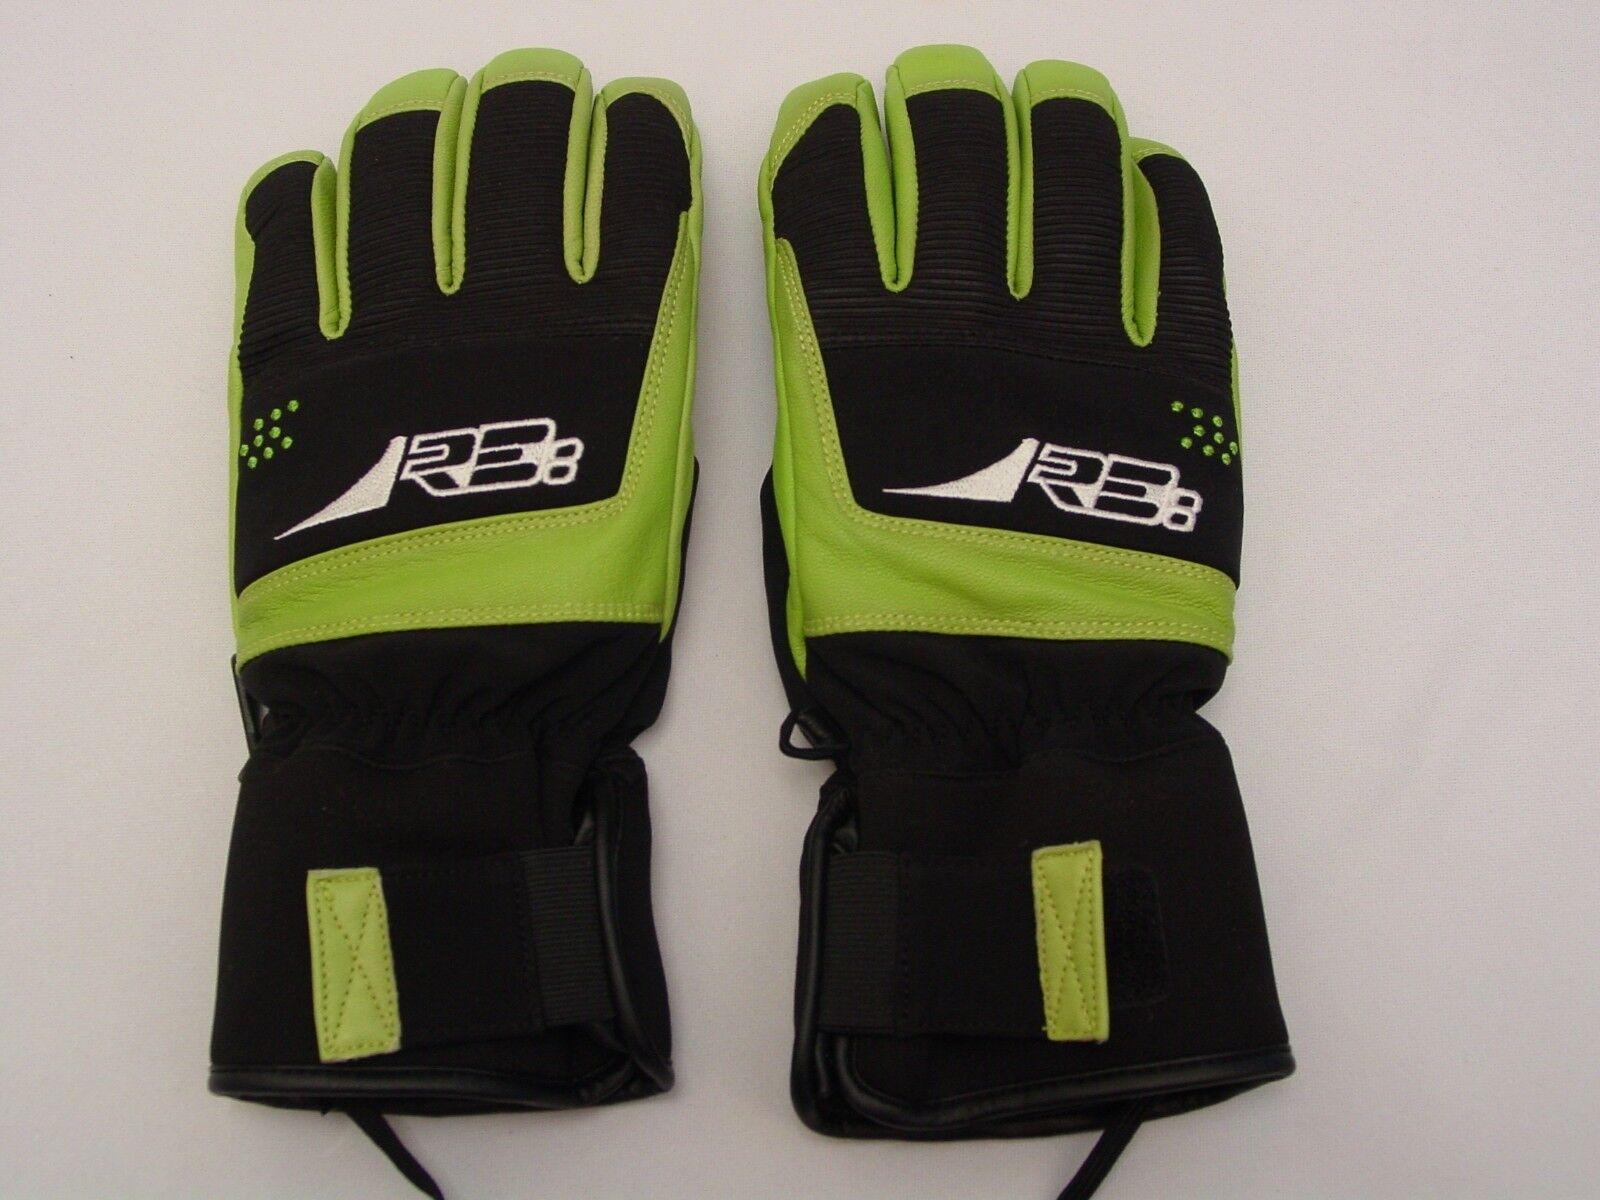 Reusch Slash Leder Palmen Ski Handschuhe Medium 8.5 4102205s Schwarz & Grün